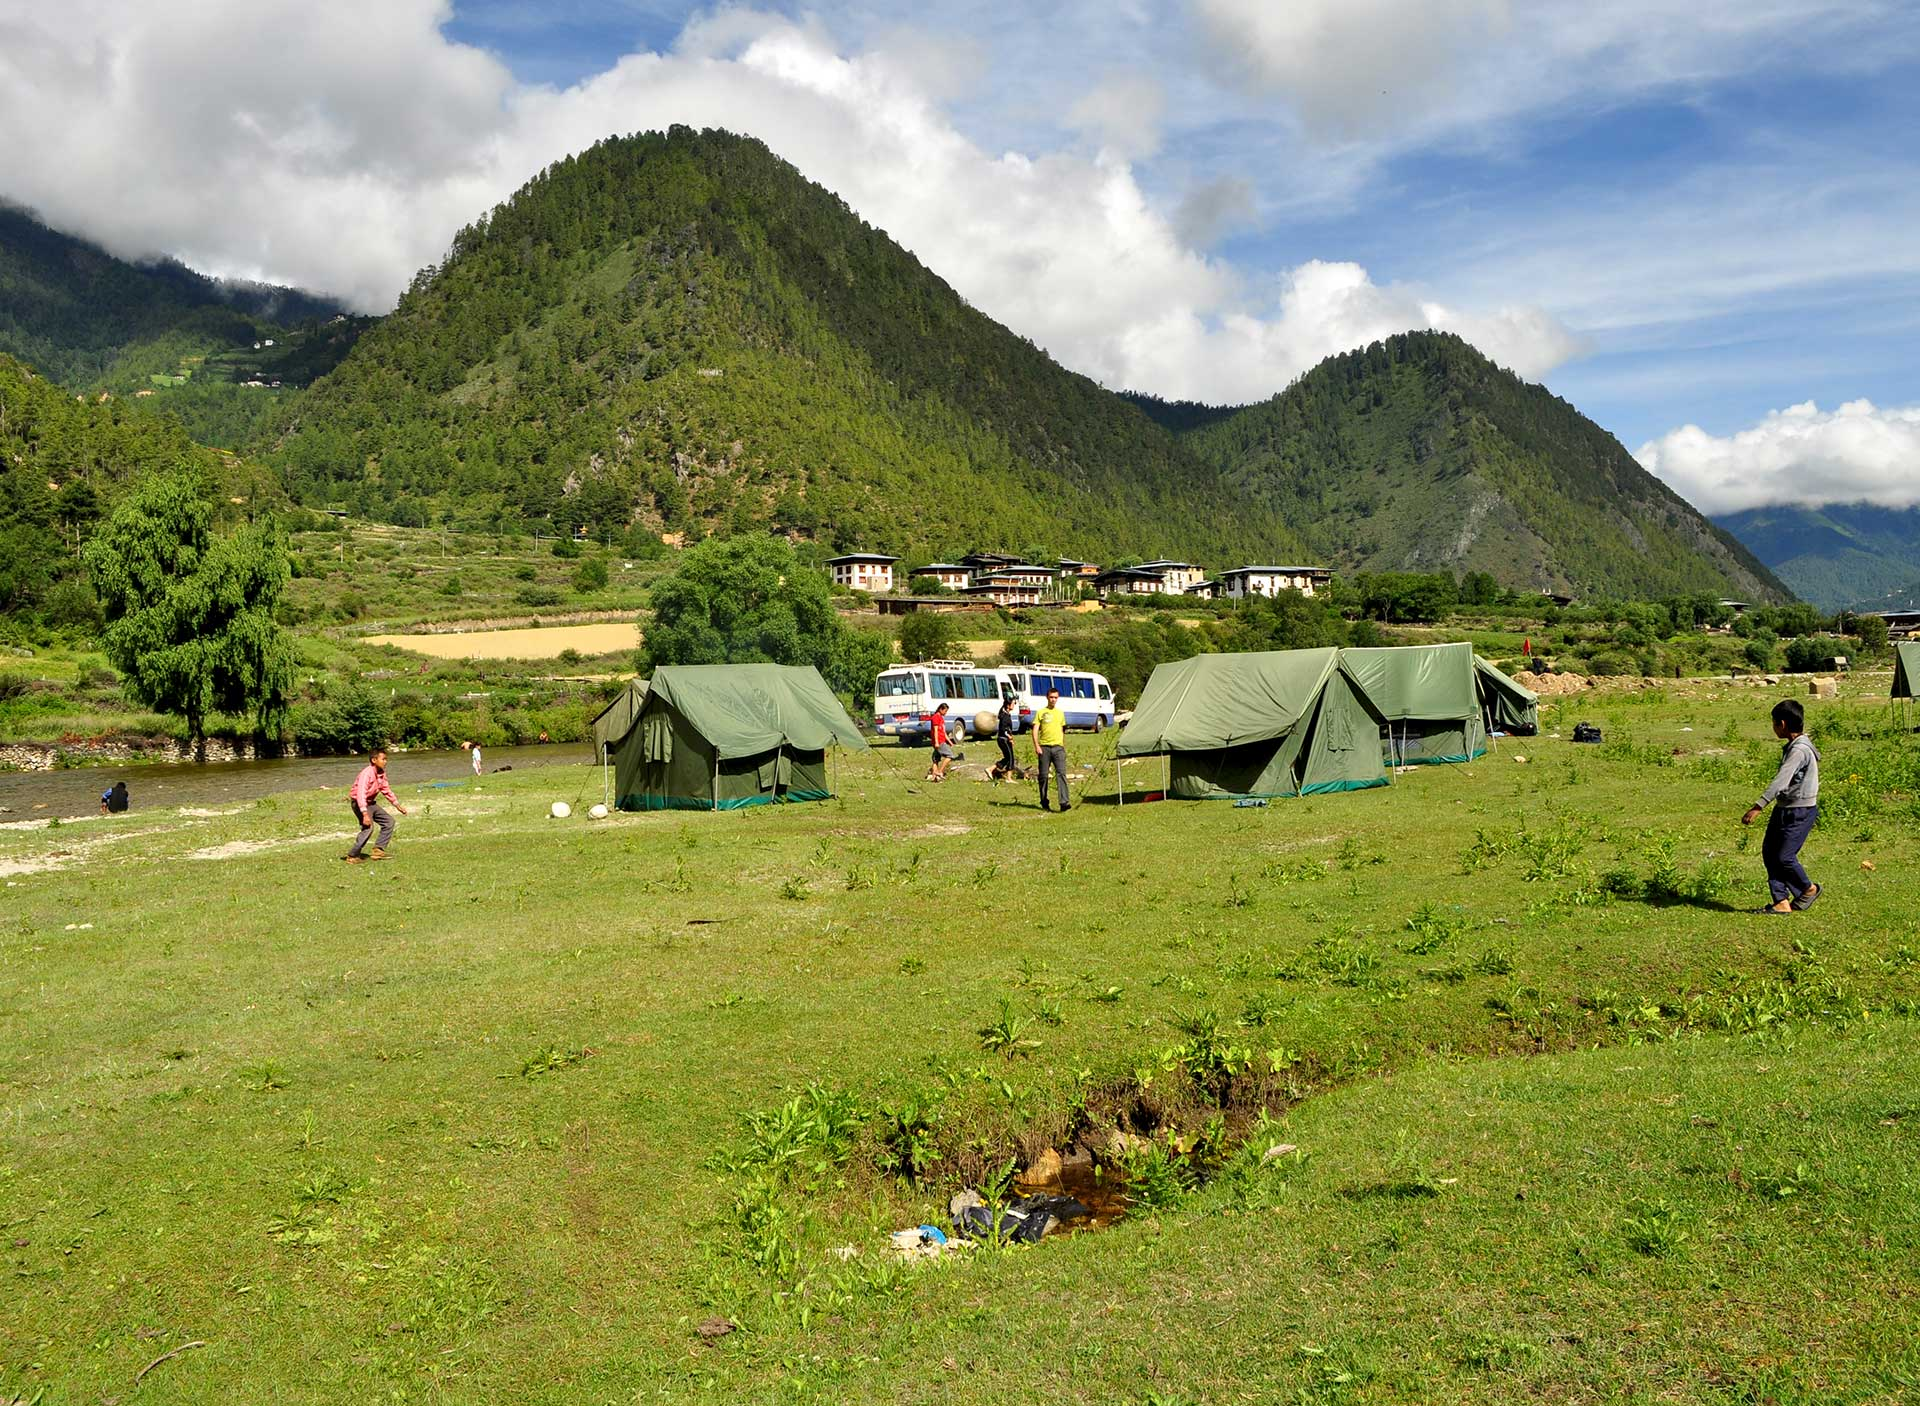 Central-Bhutan-&-Haa-valley-tour